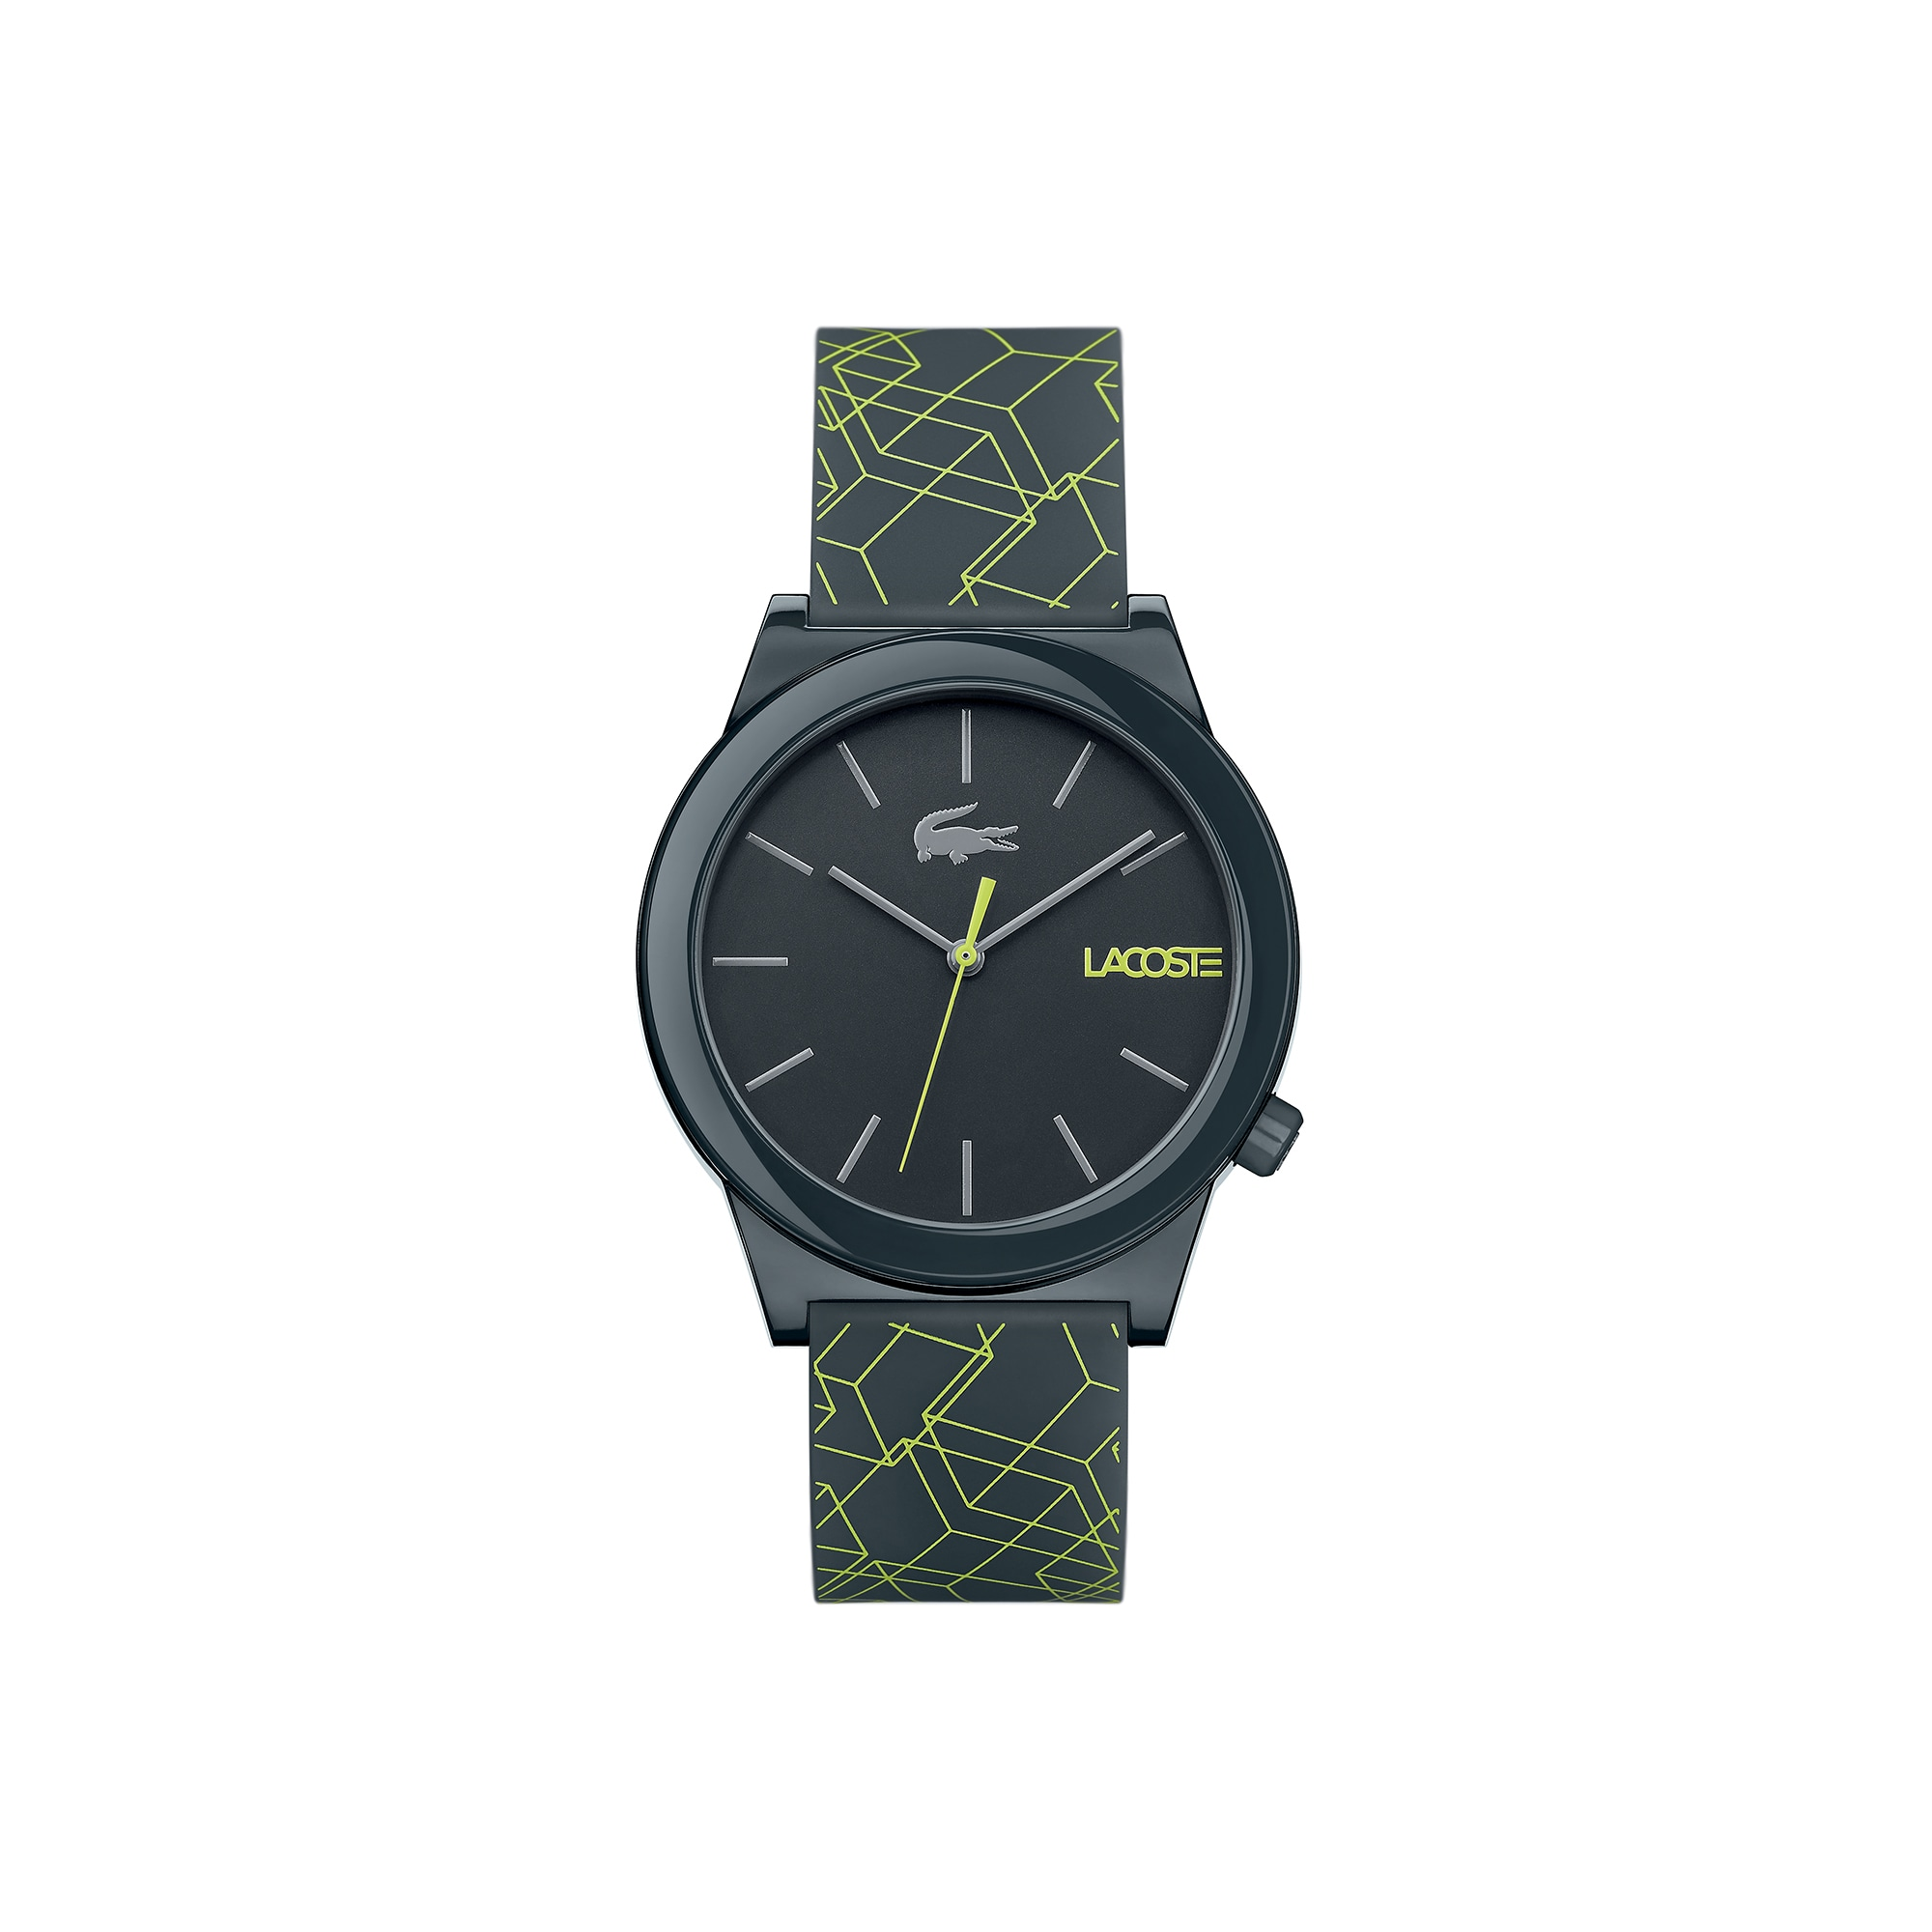 Reloj Motion con pulsera de silicona gris